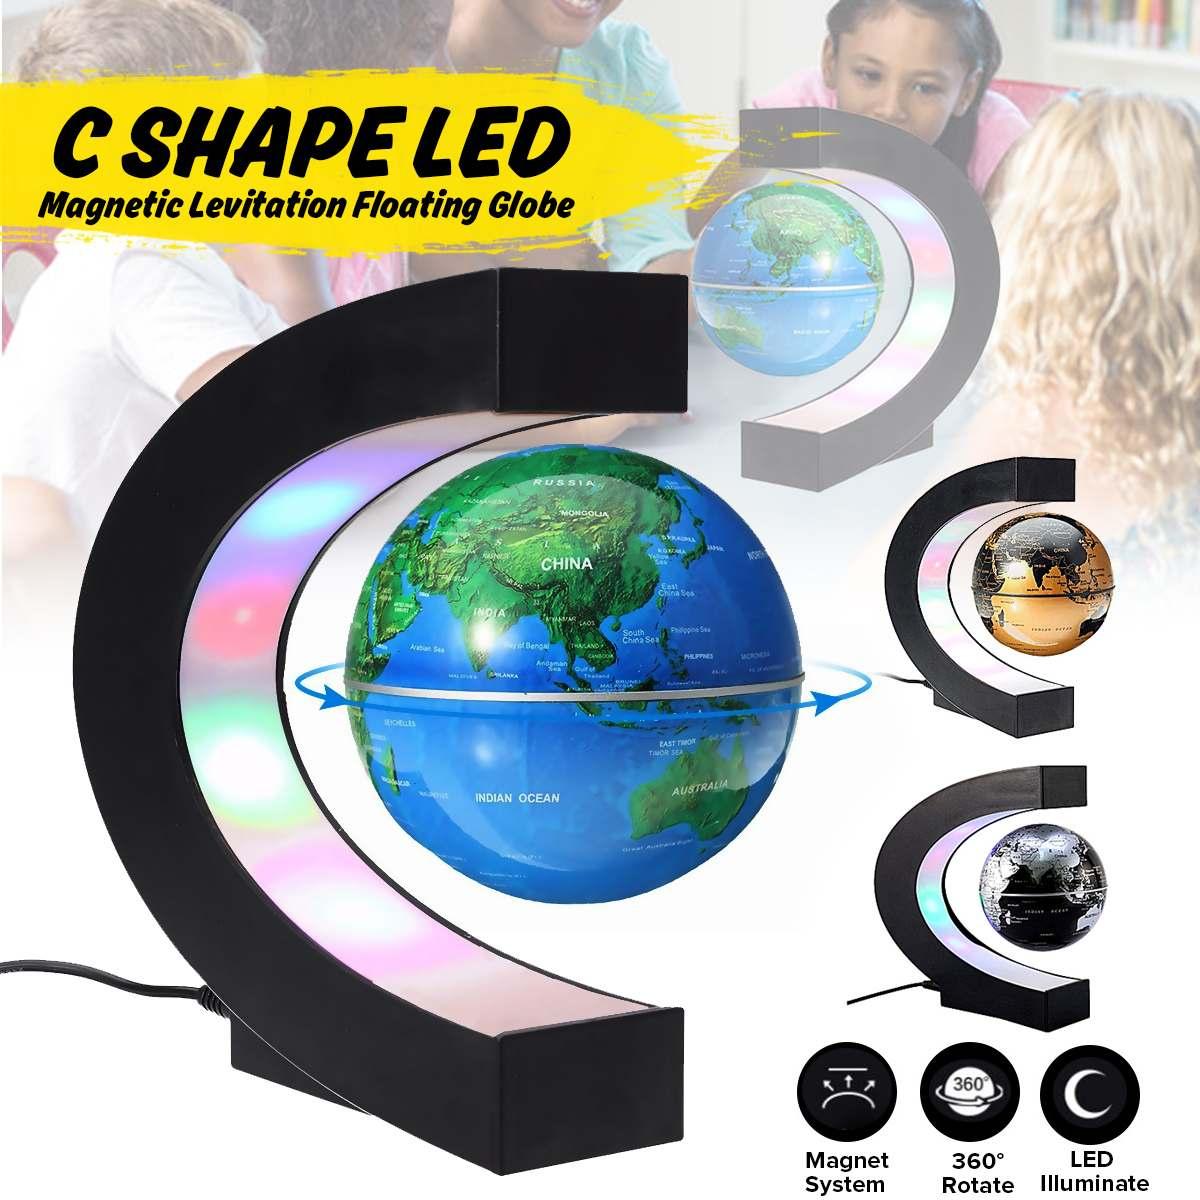 Globo de levitación magnética led luz nocturna flotante mapa del mundo lámpara de bola iluminación fresca Oficina decoración del hogar lámpara de globo terrestre